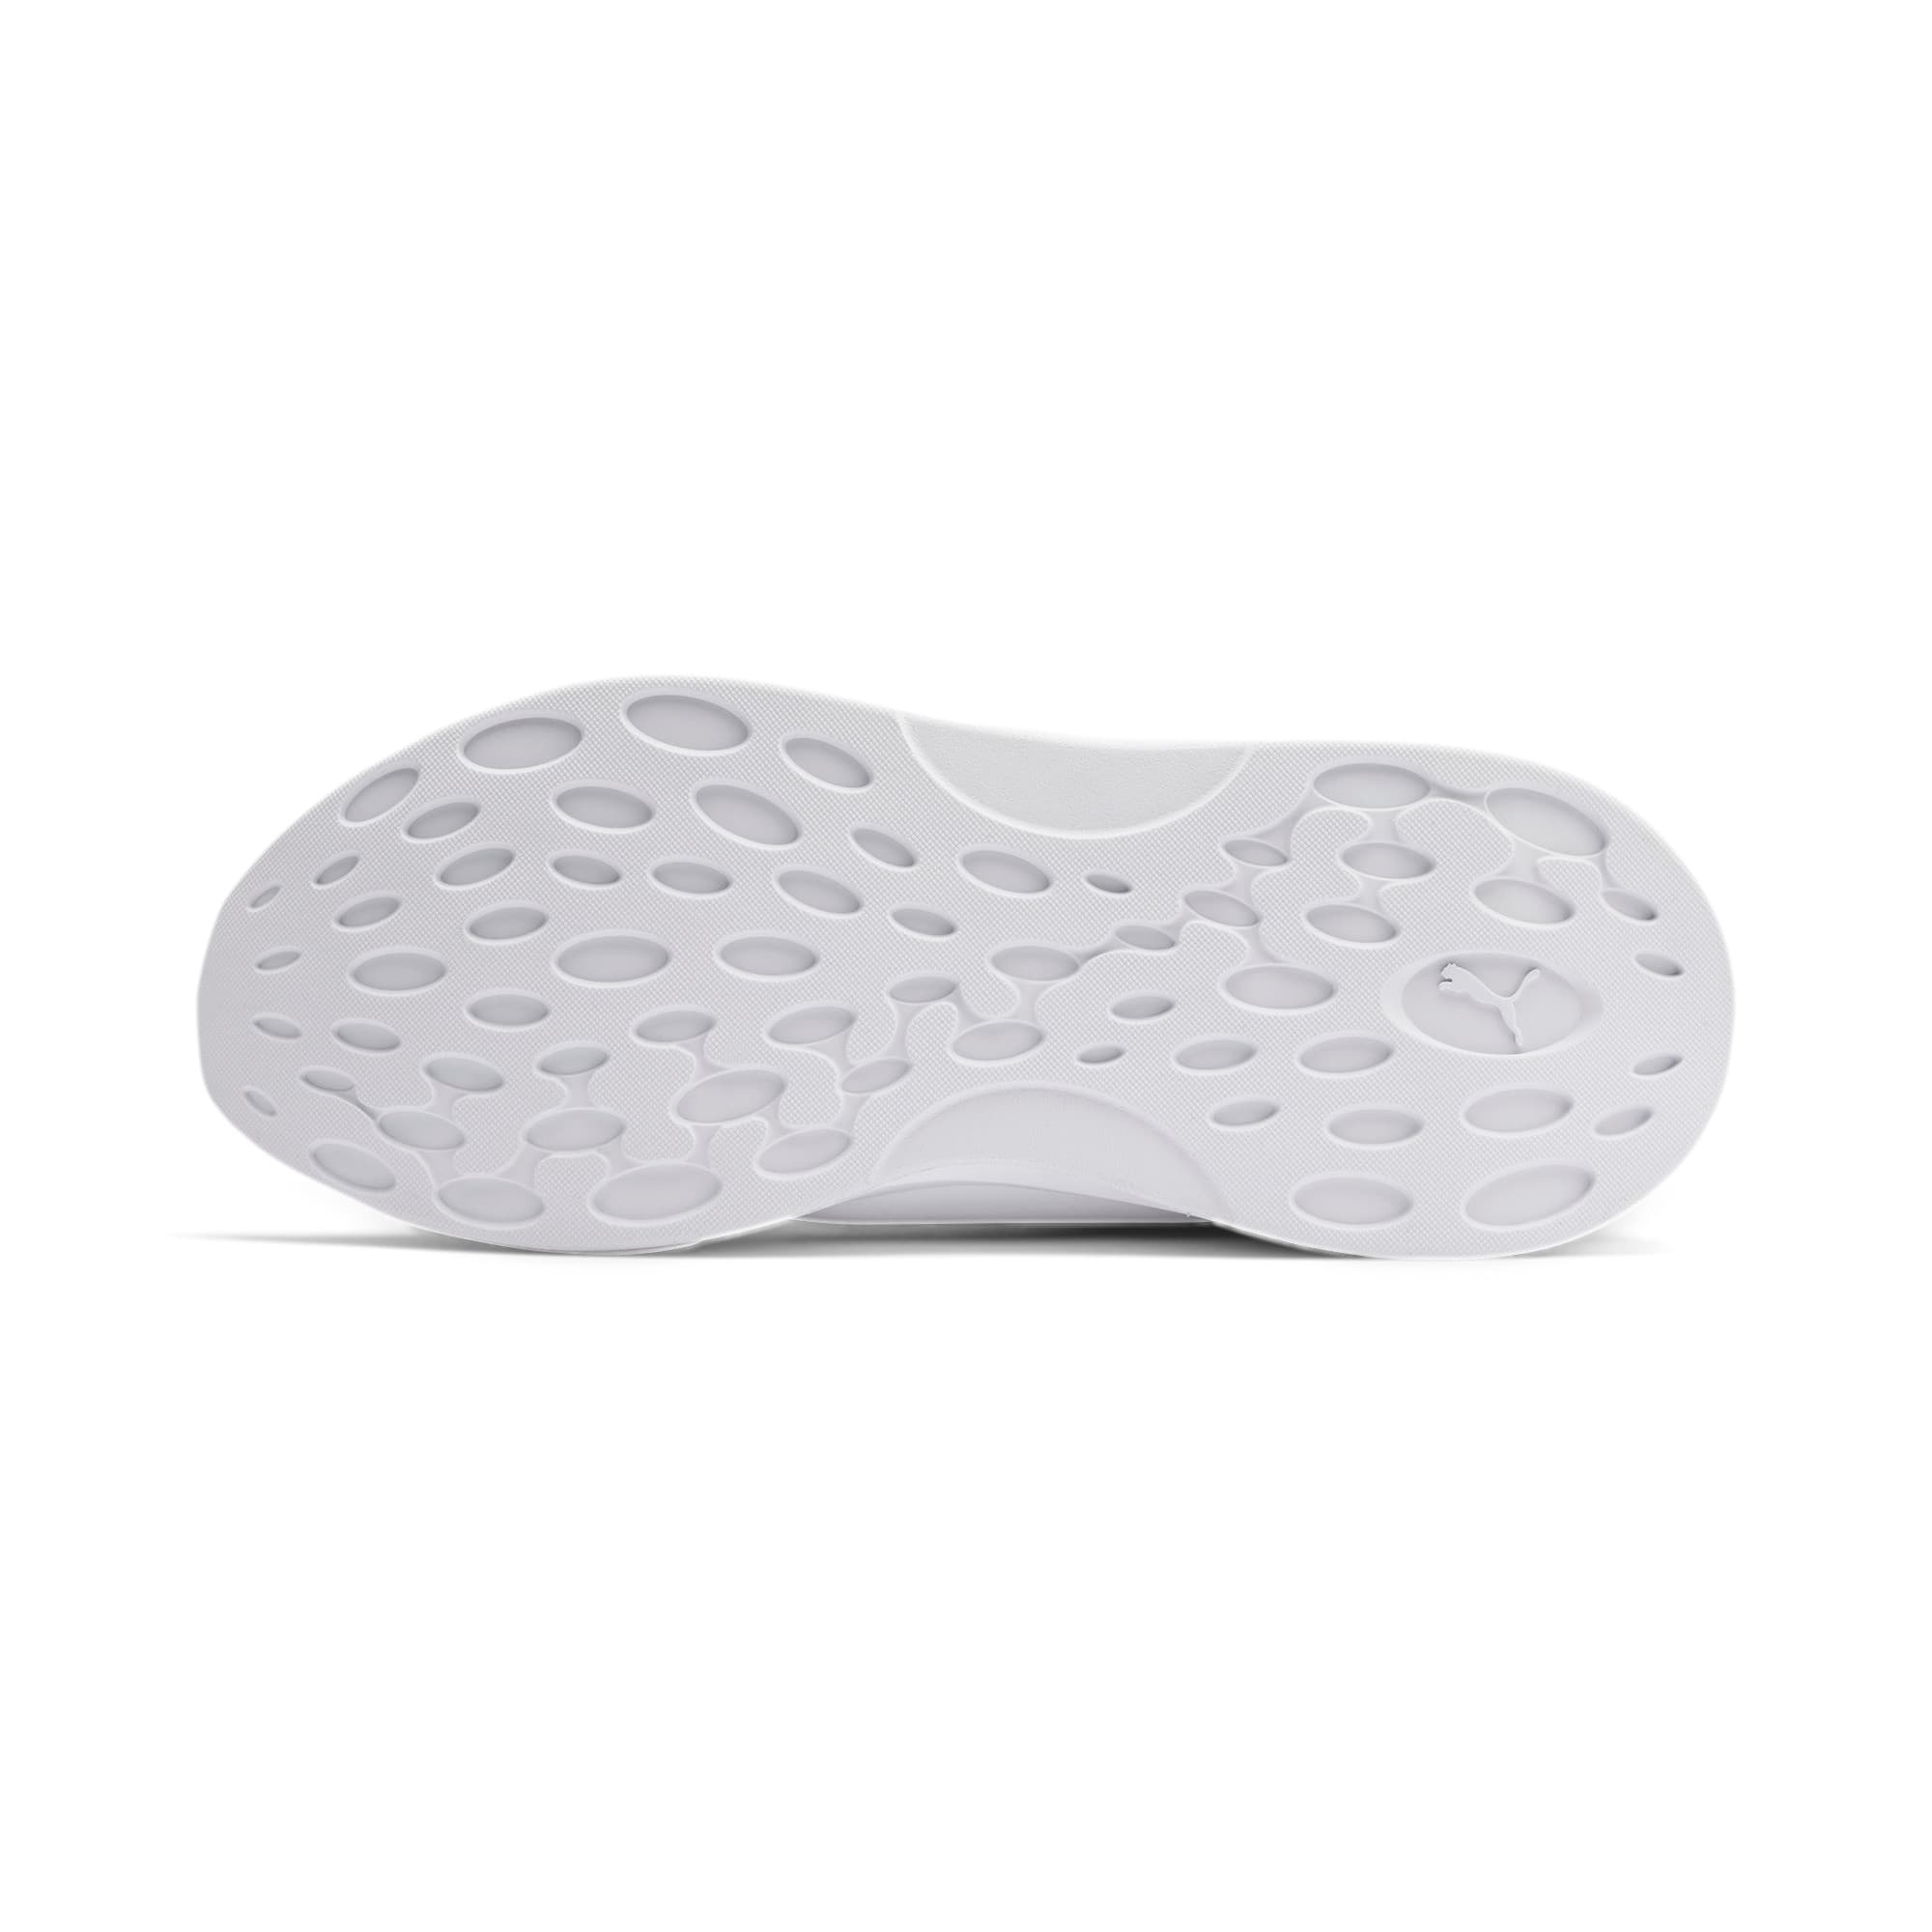 Thumbnail 4 of RS 9.8 Core Sneakers, Puma White, medium